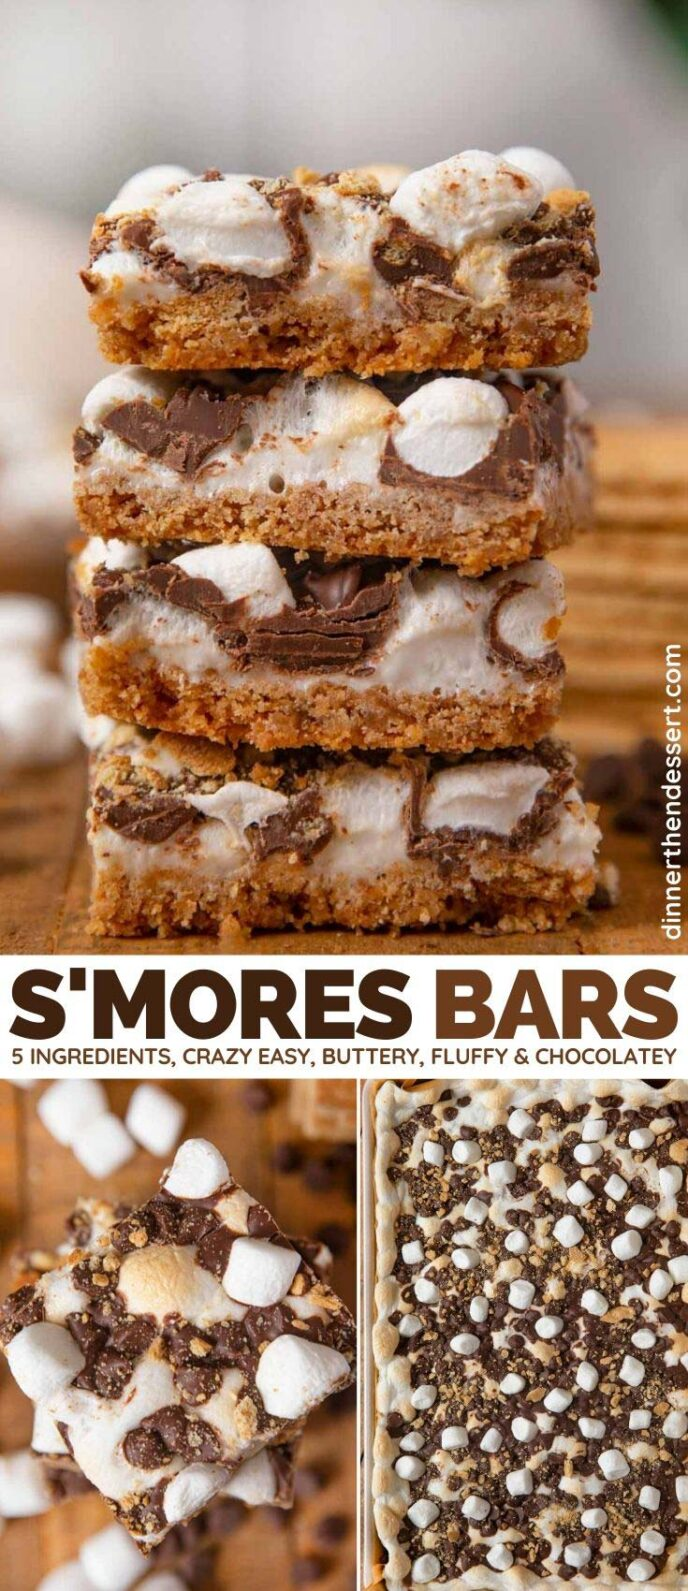 Collage of Smores Bars photos